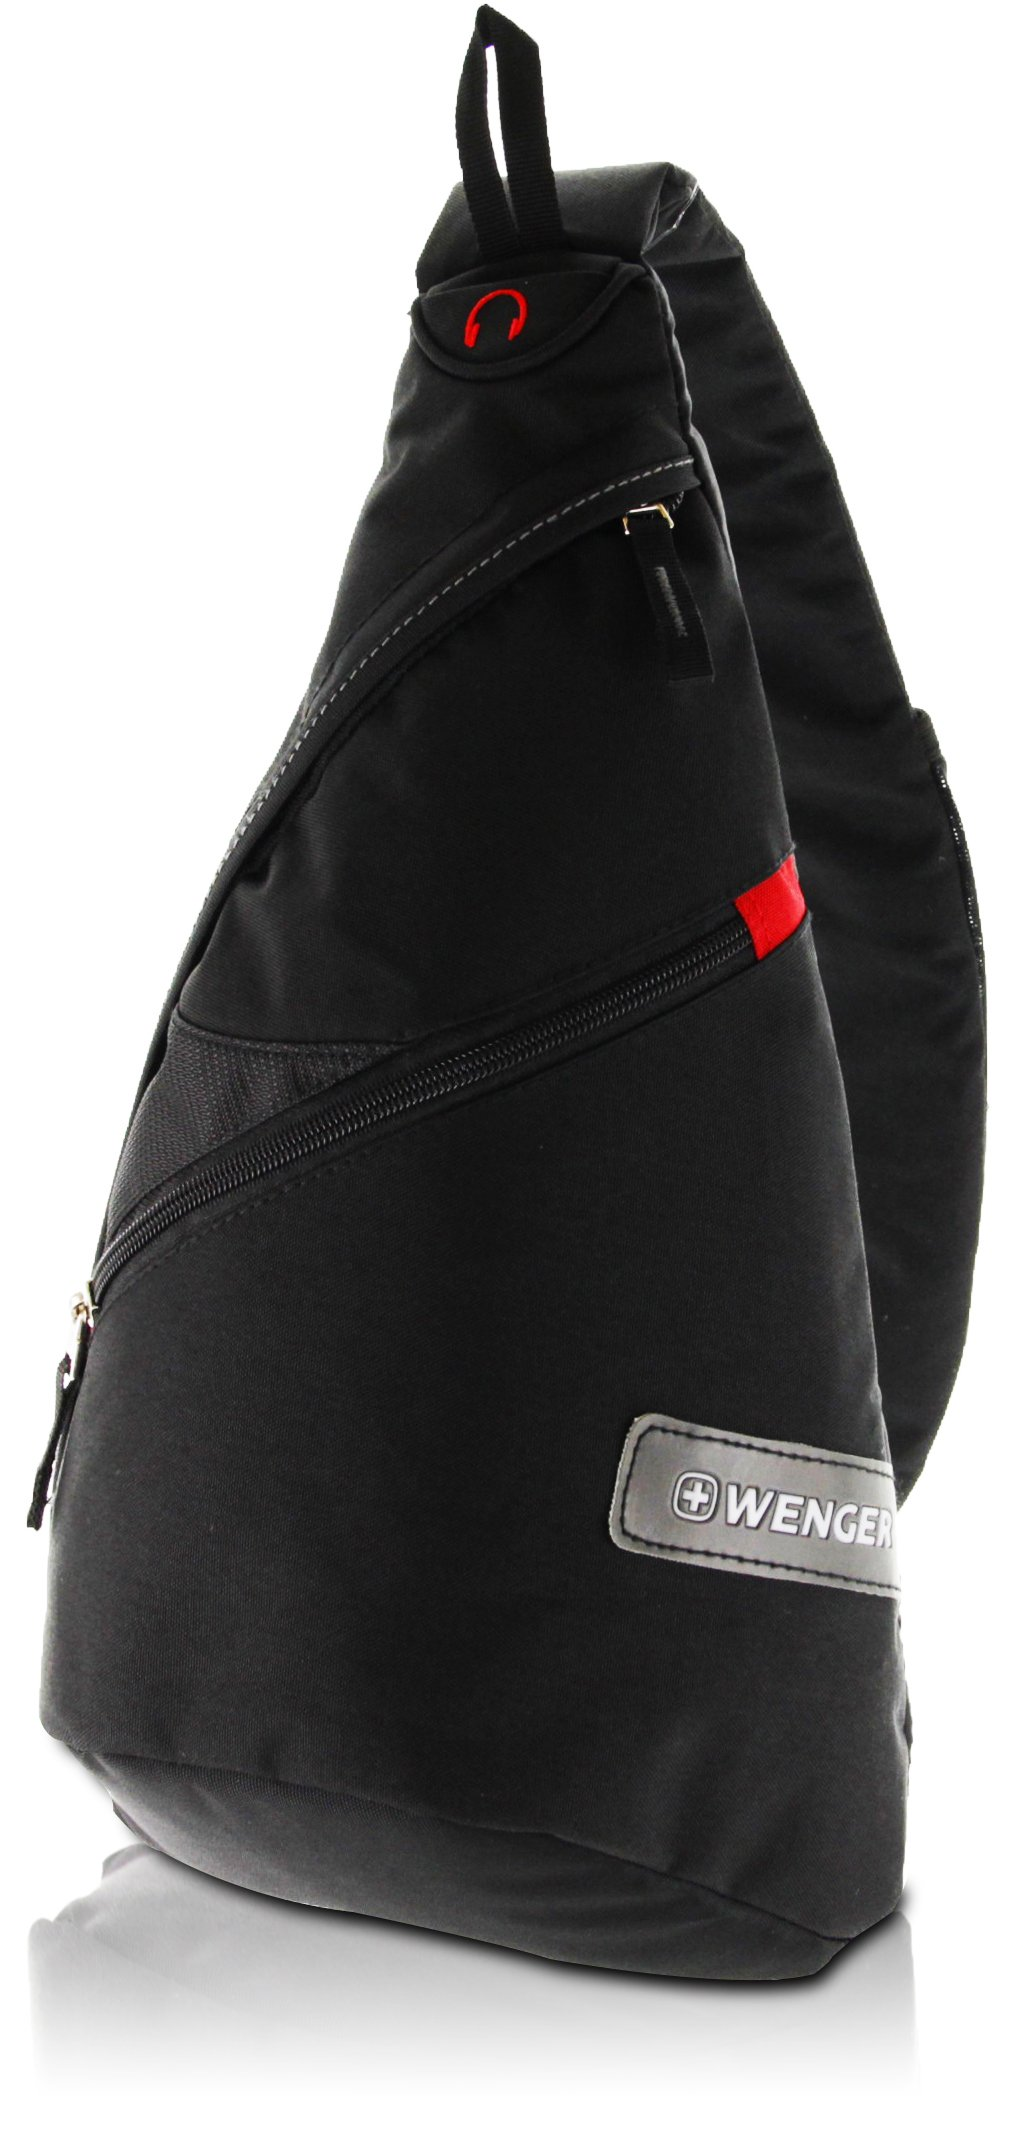 71FQBg4gbwL - WENGER® Premium Slingbag para hombres y mujeres, 10 litros, Sling Backpack Hombro en negro con forro interior gris